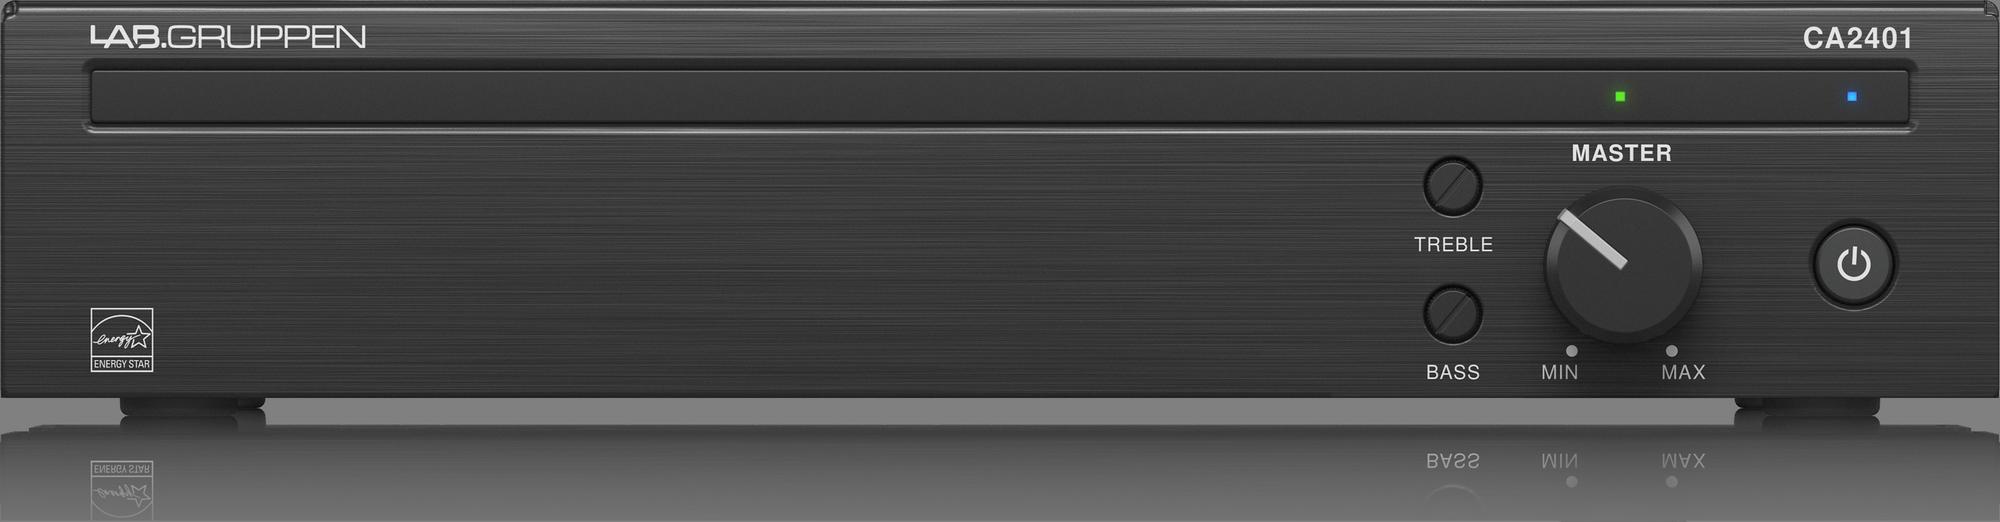 Lab Gruppen CA1201 - Leistungsverstärker